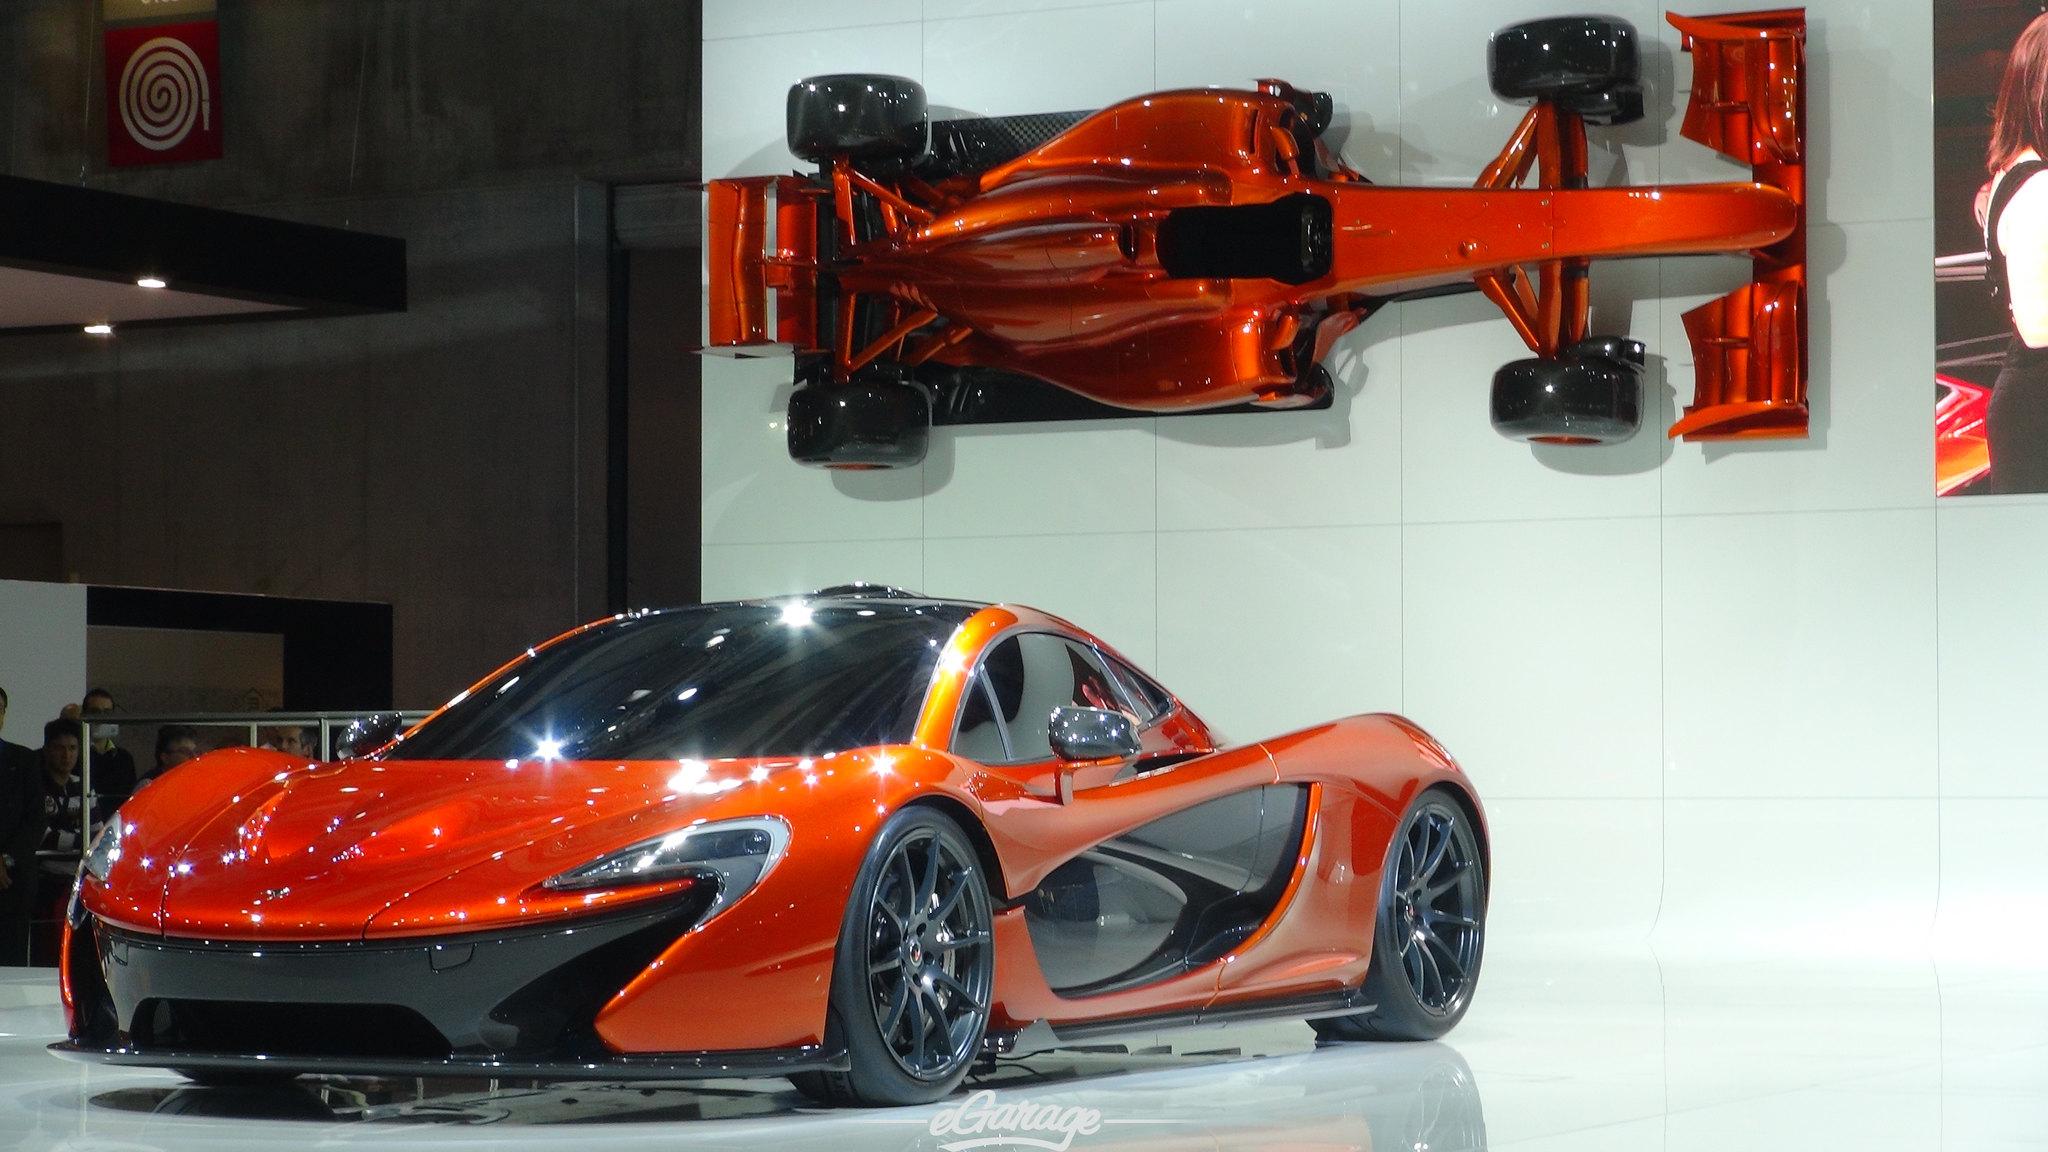 8030426831 3353a27a18 k 2012 Paris Motor Show